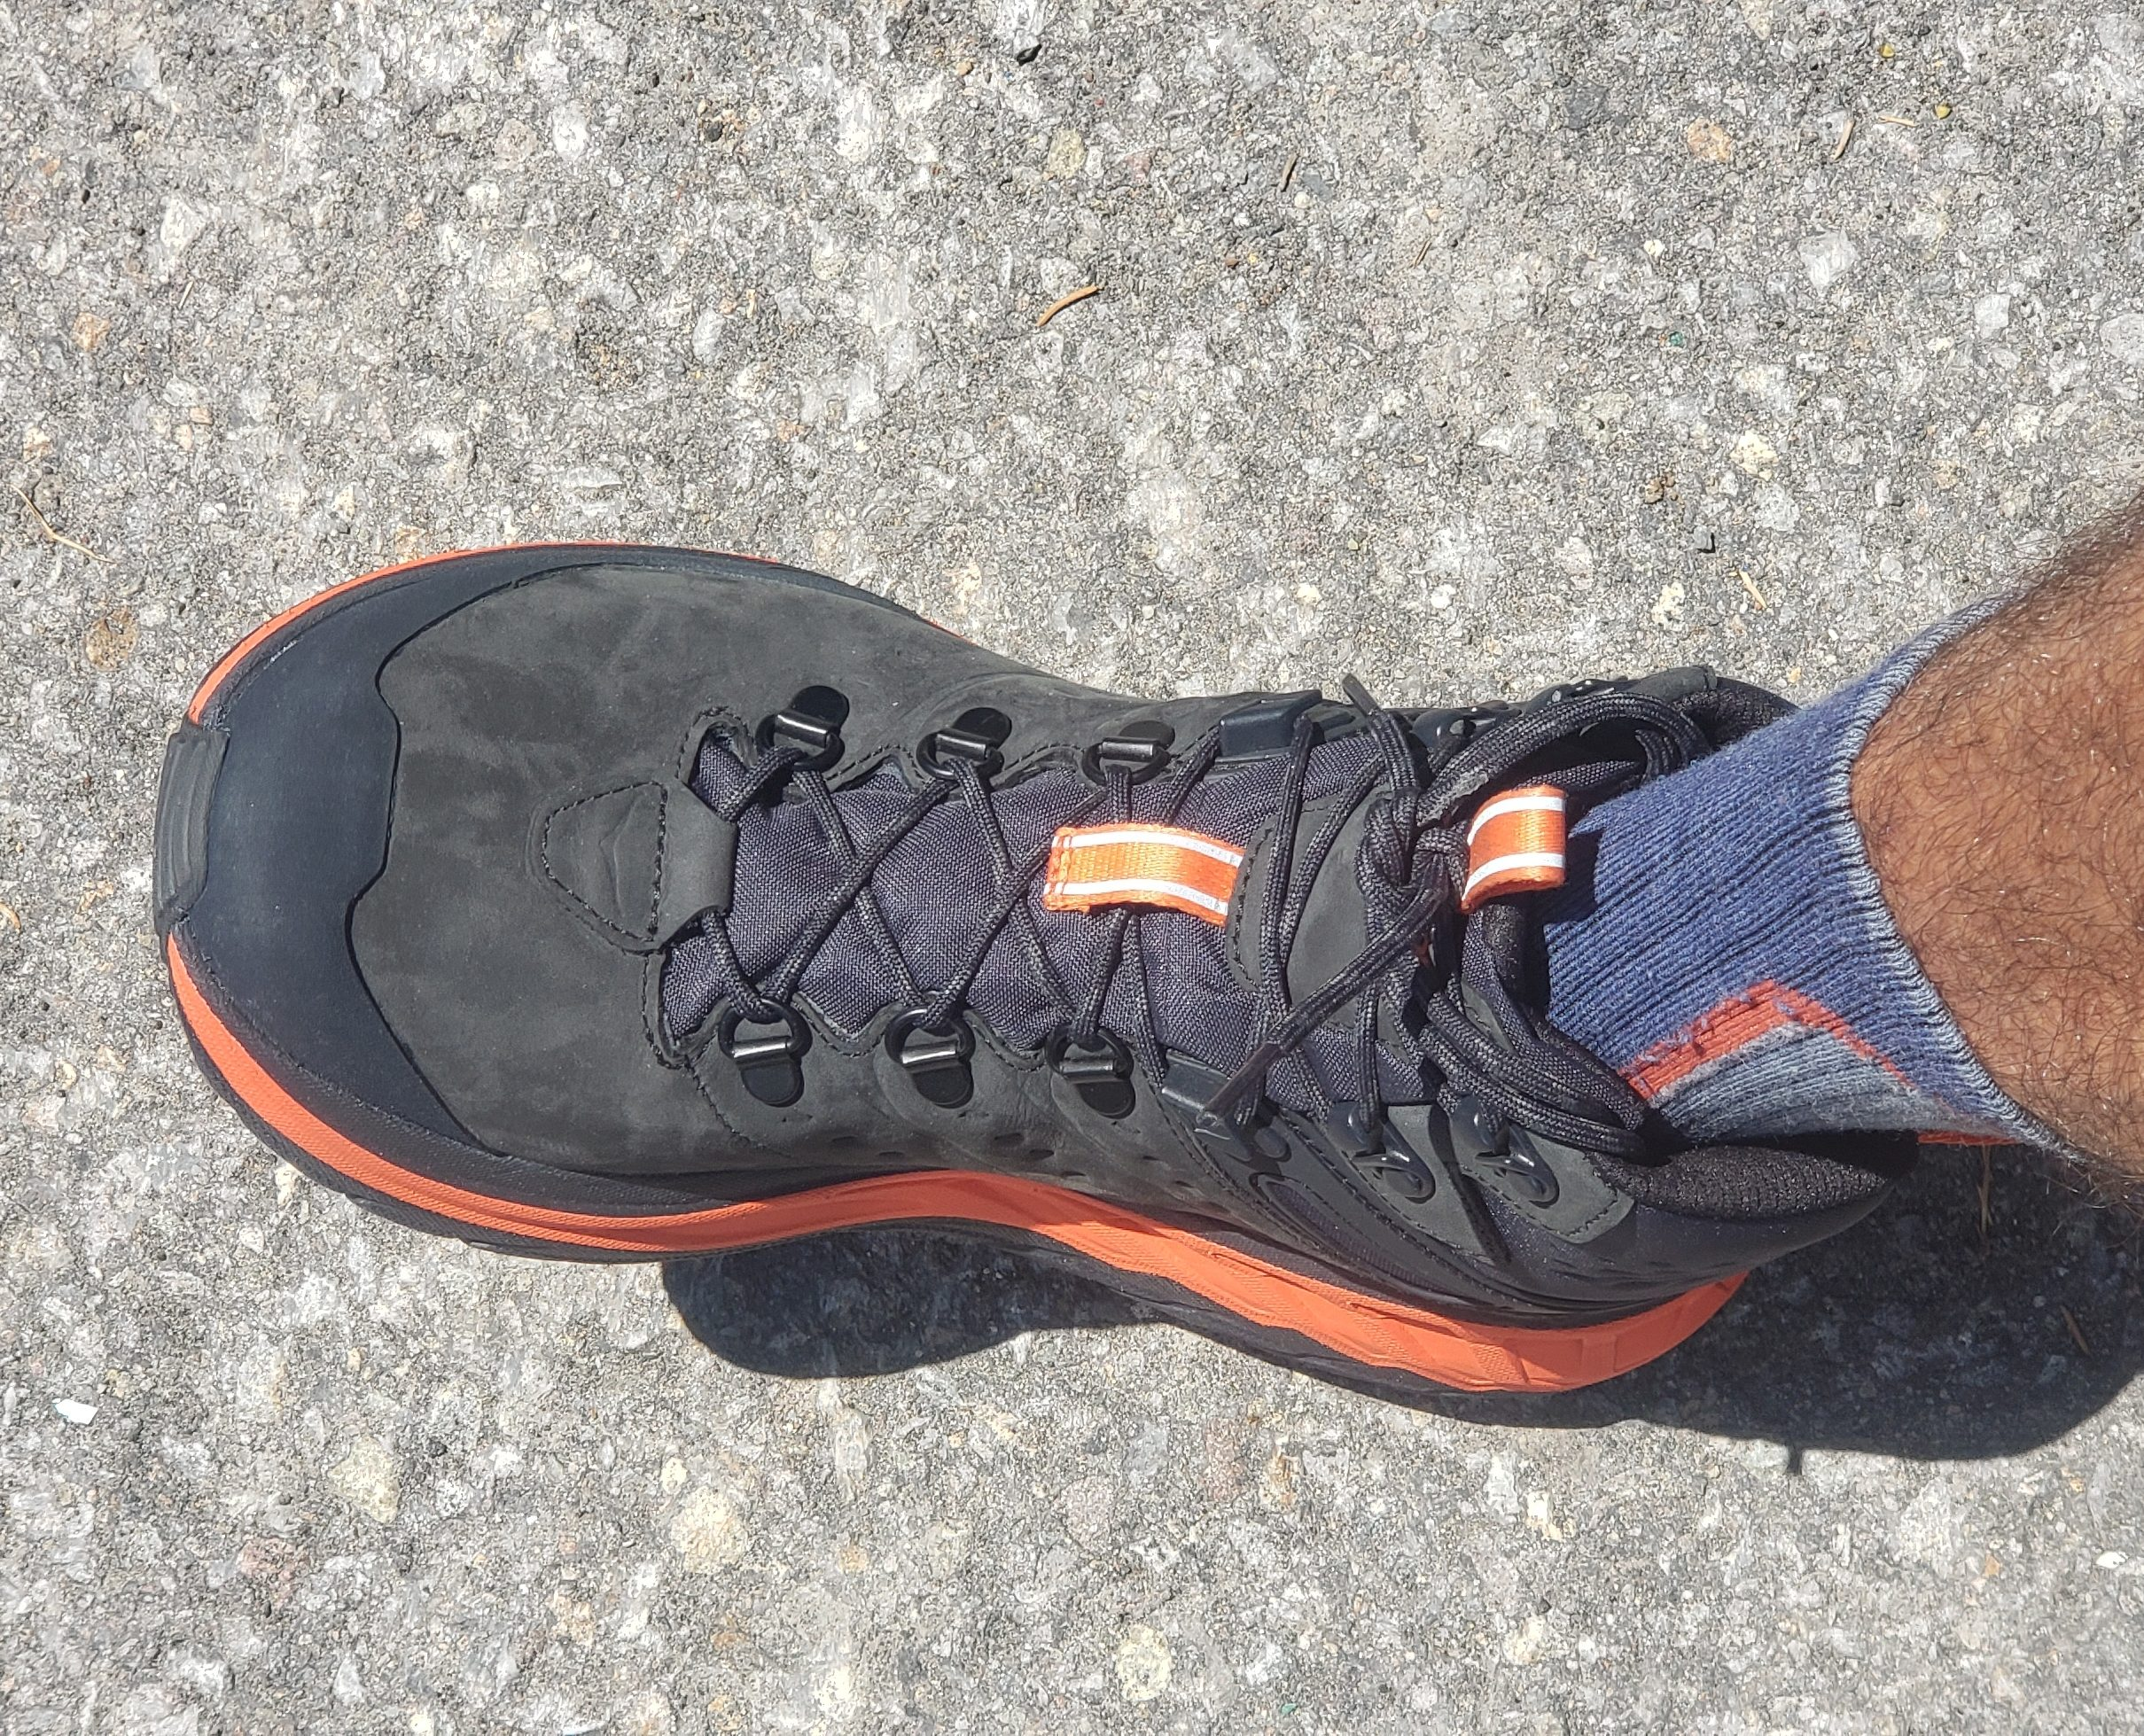 Hoka One One Stinson Mid GTX Hiking Shoe - lacing